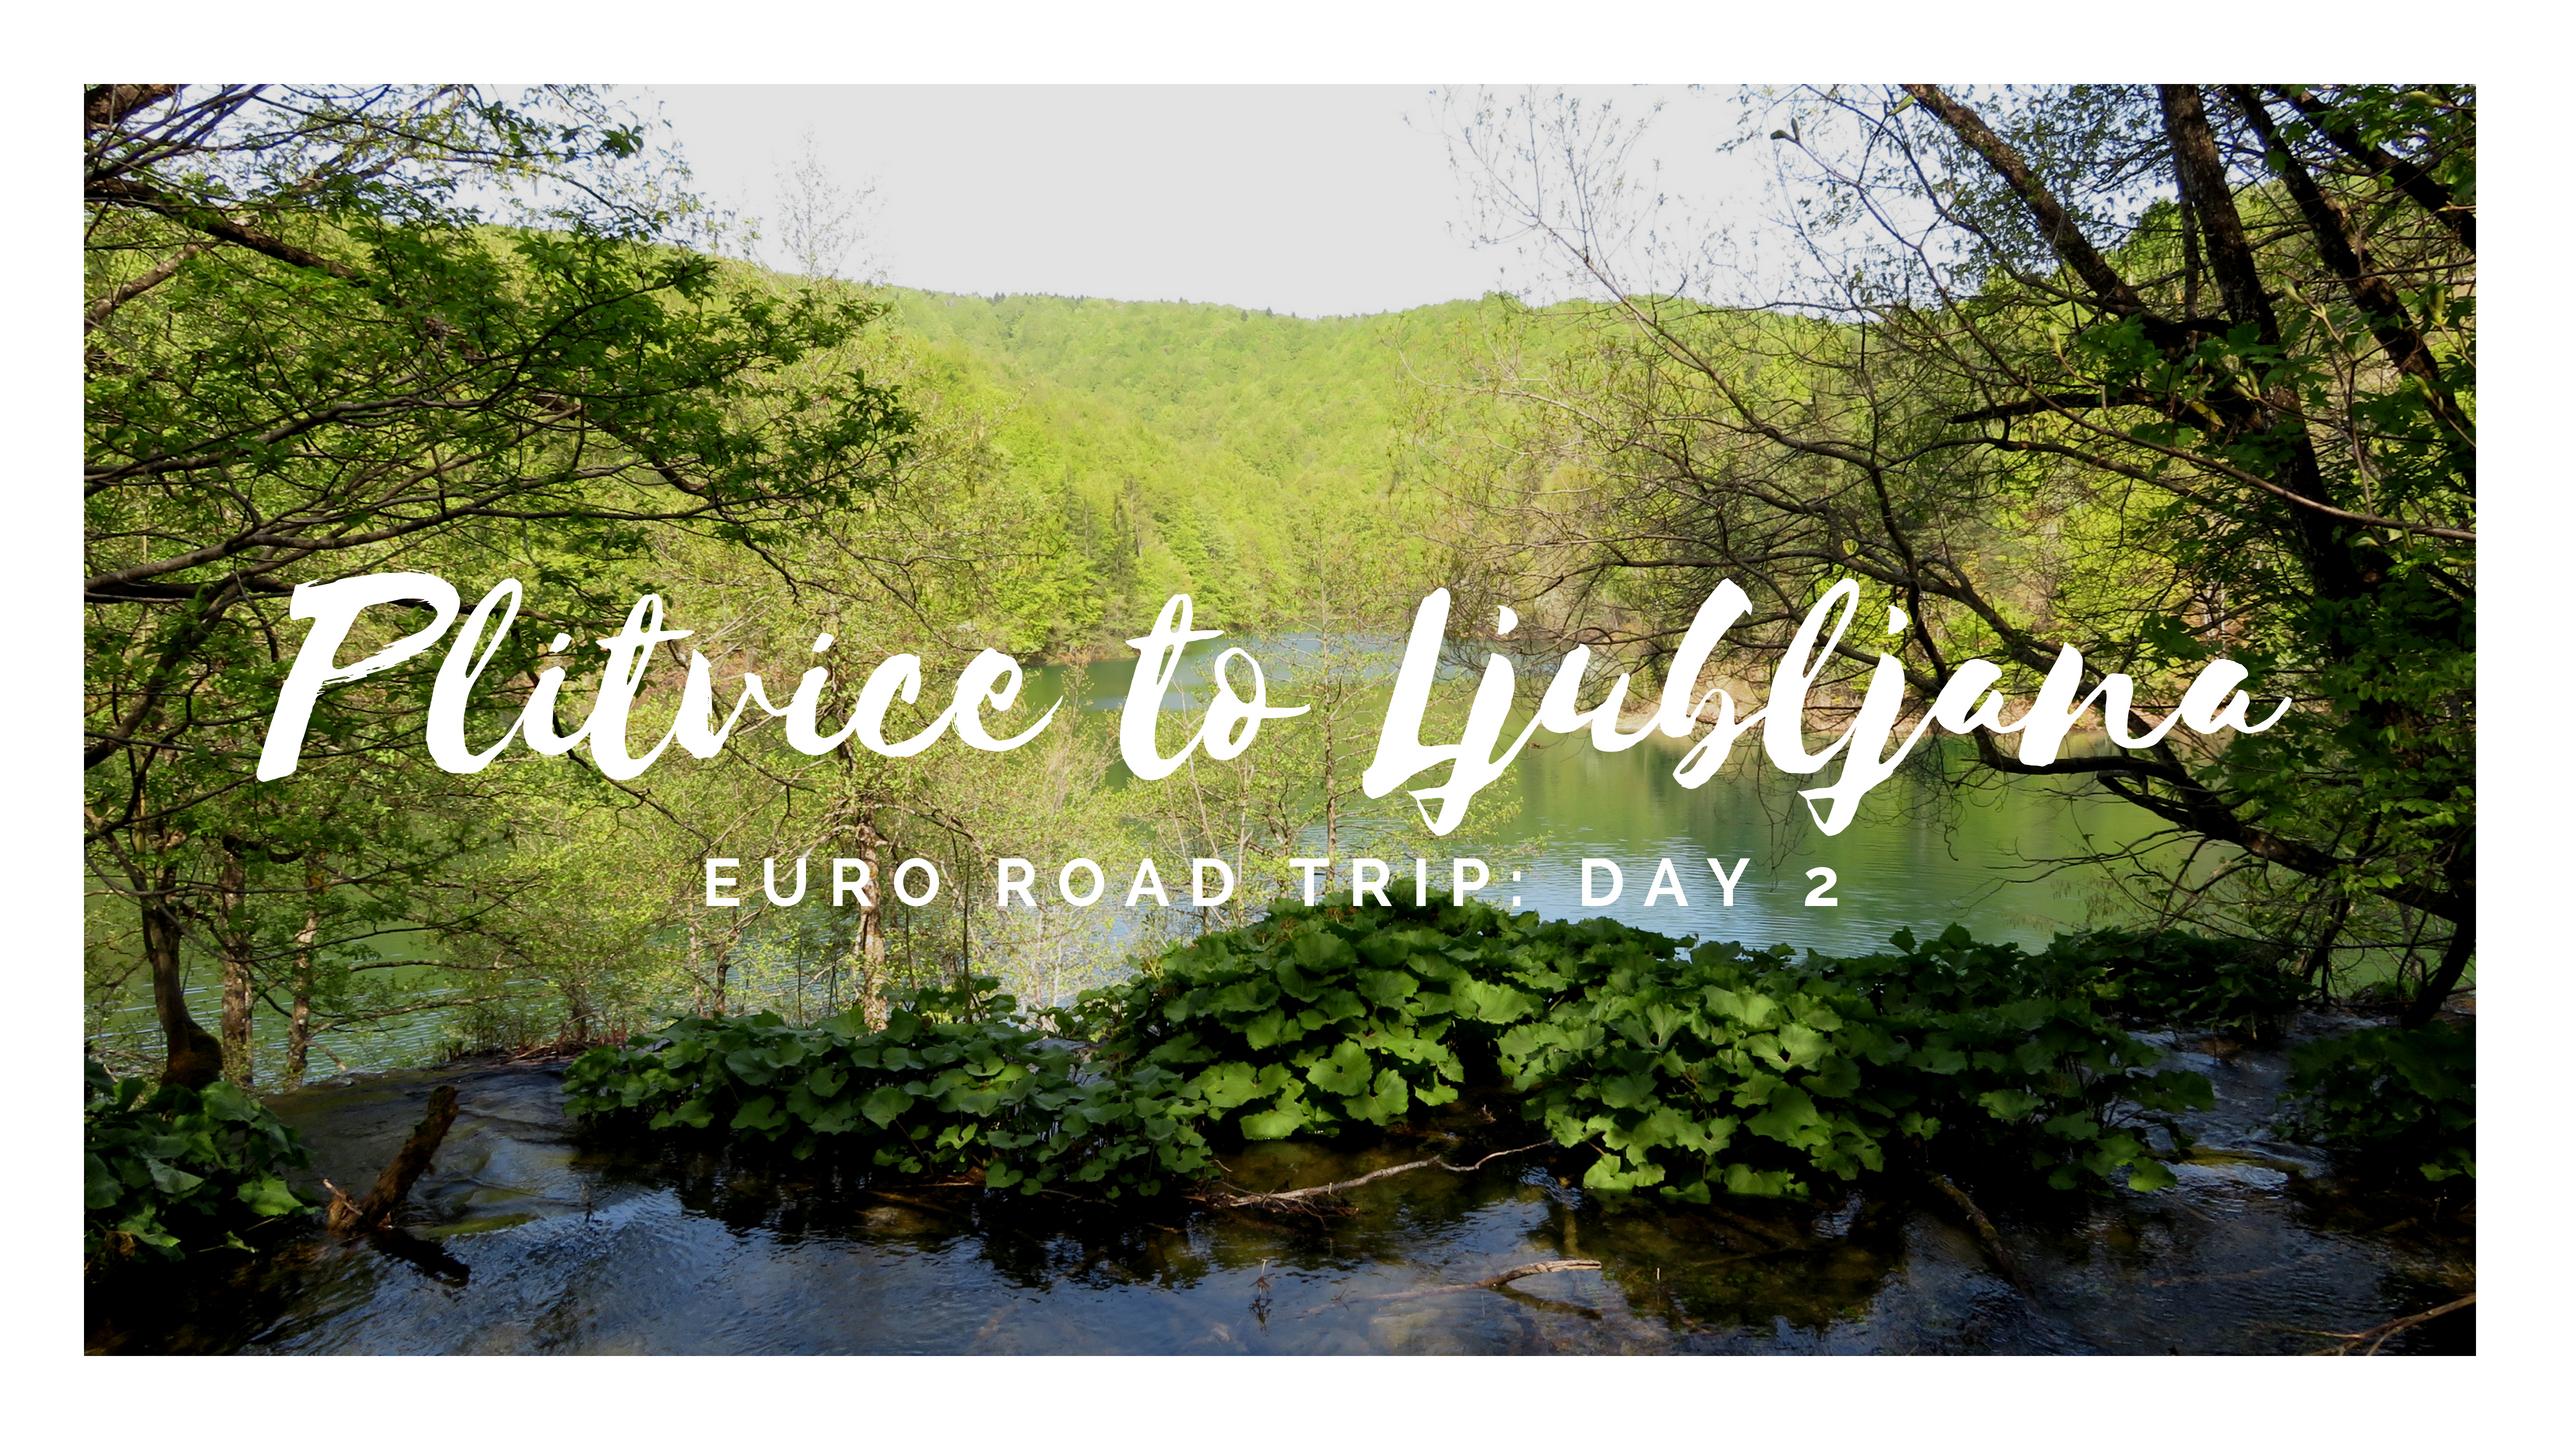 Euro Road Trip – Day 2: Plitvice to Ljubliana